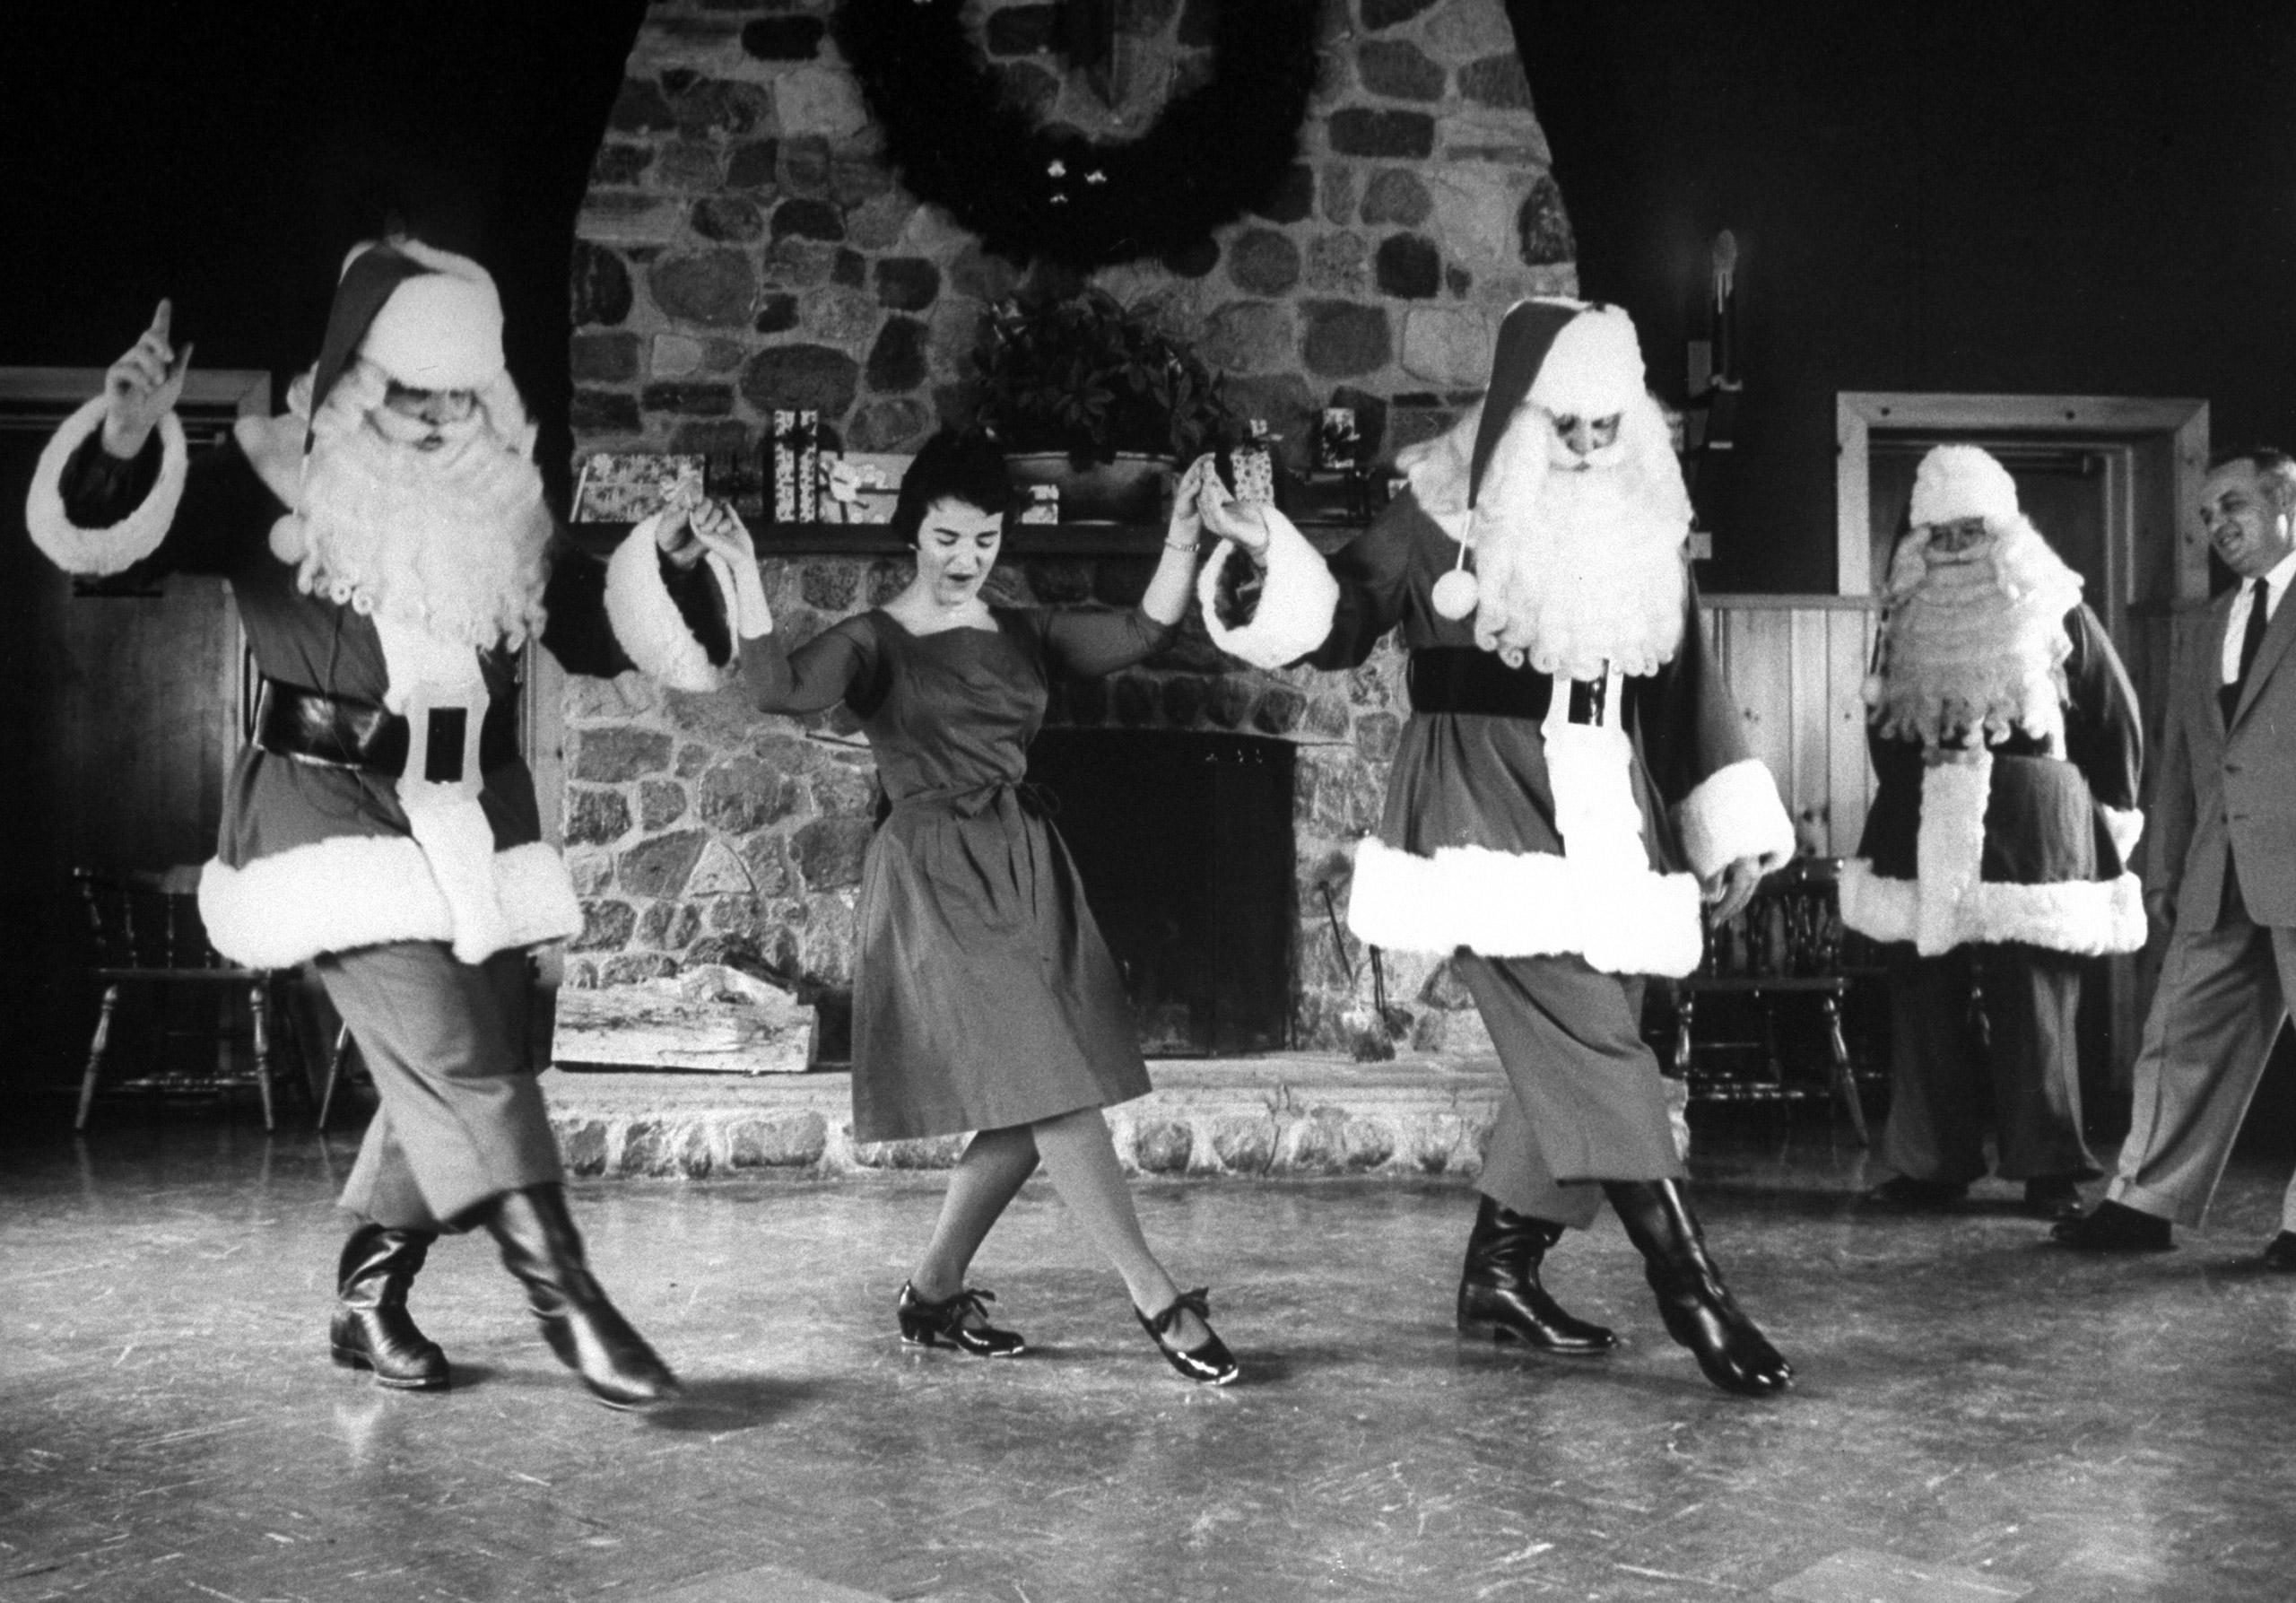 Ken Berends and Bill Burslem practice a soft-shoe with faculty member Joy Merkel in Santa Claus training class at Santa Claus School, 1961.